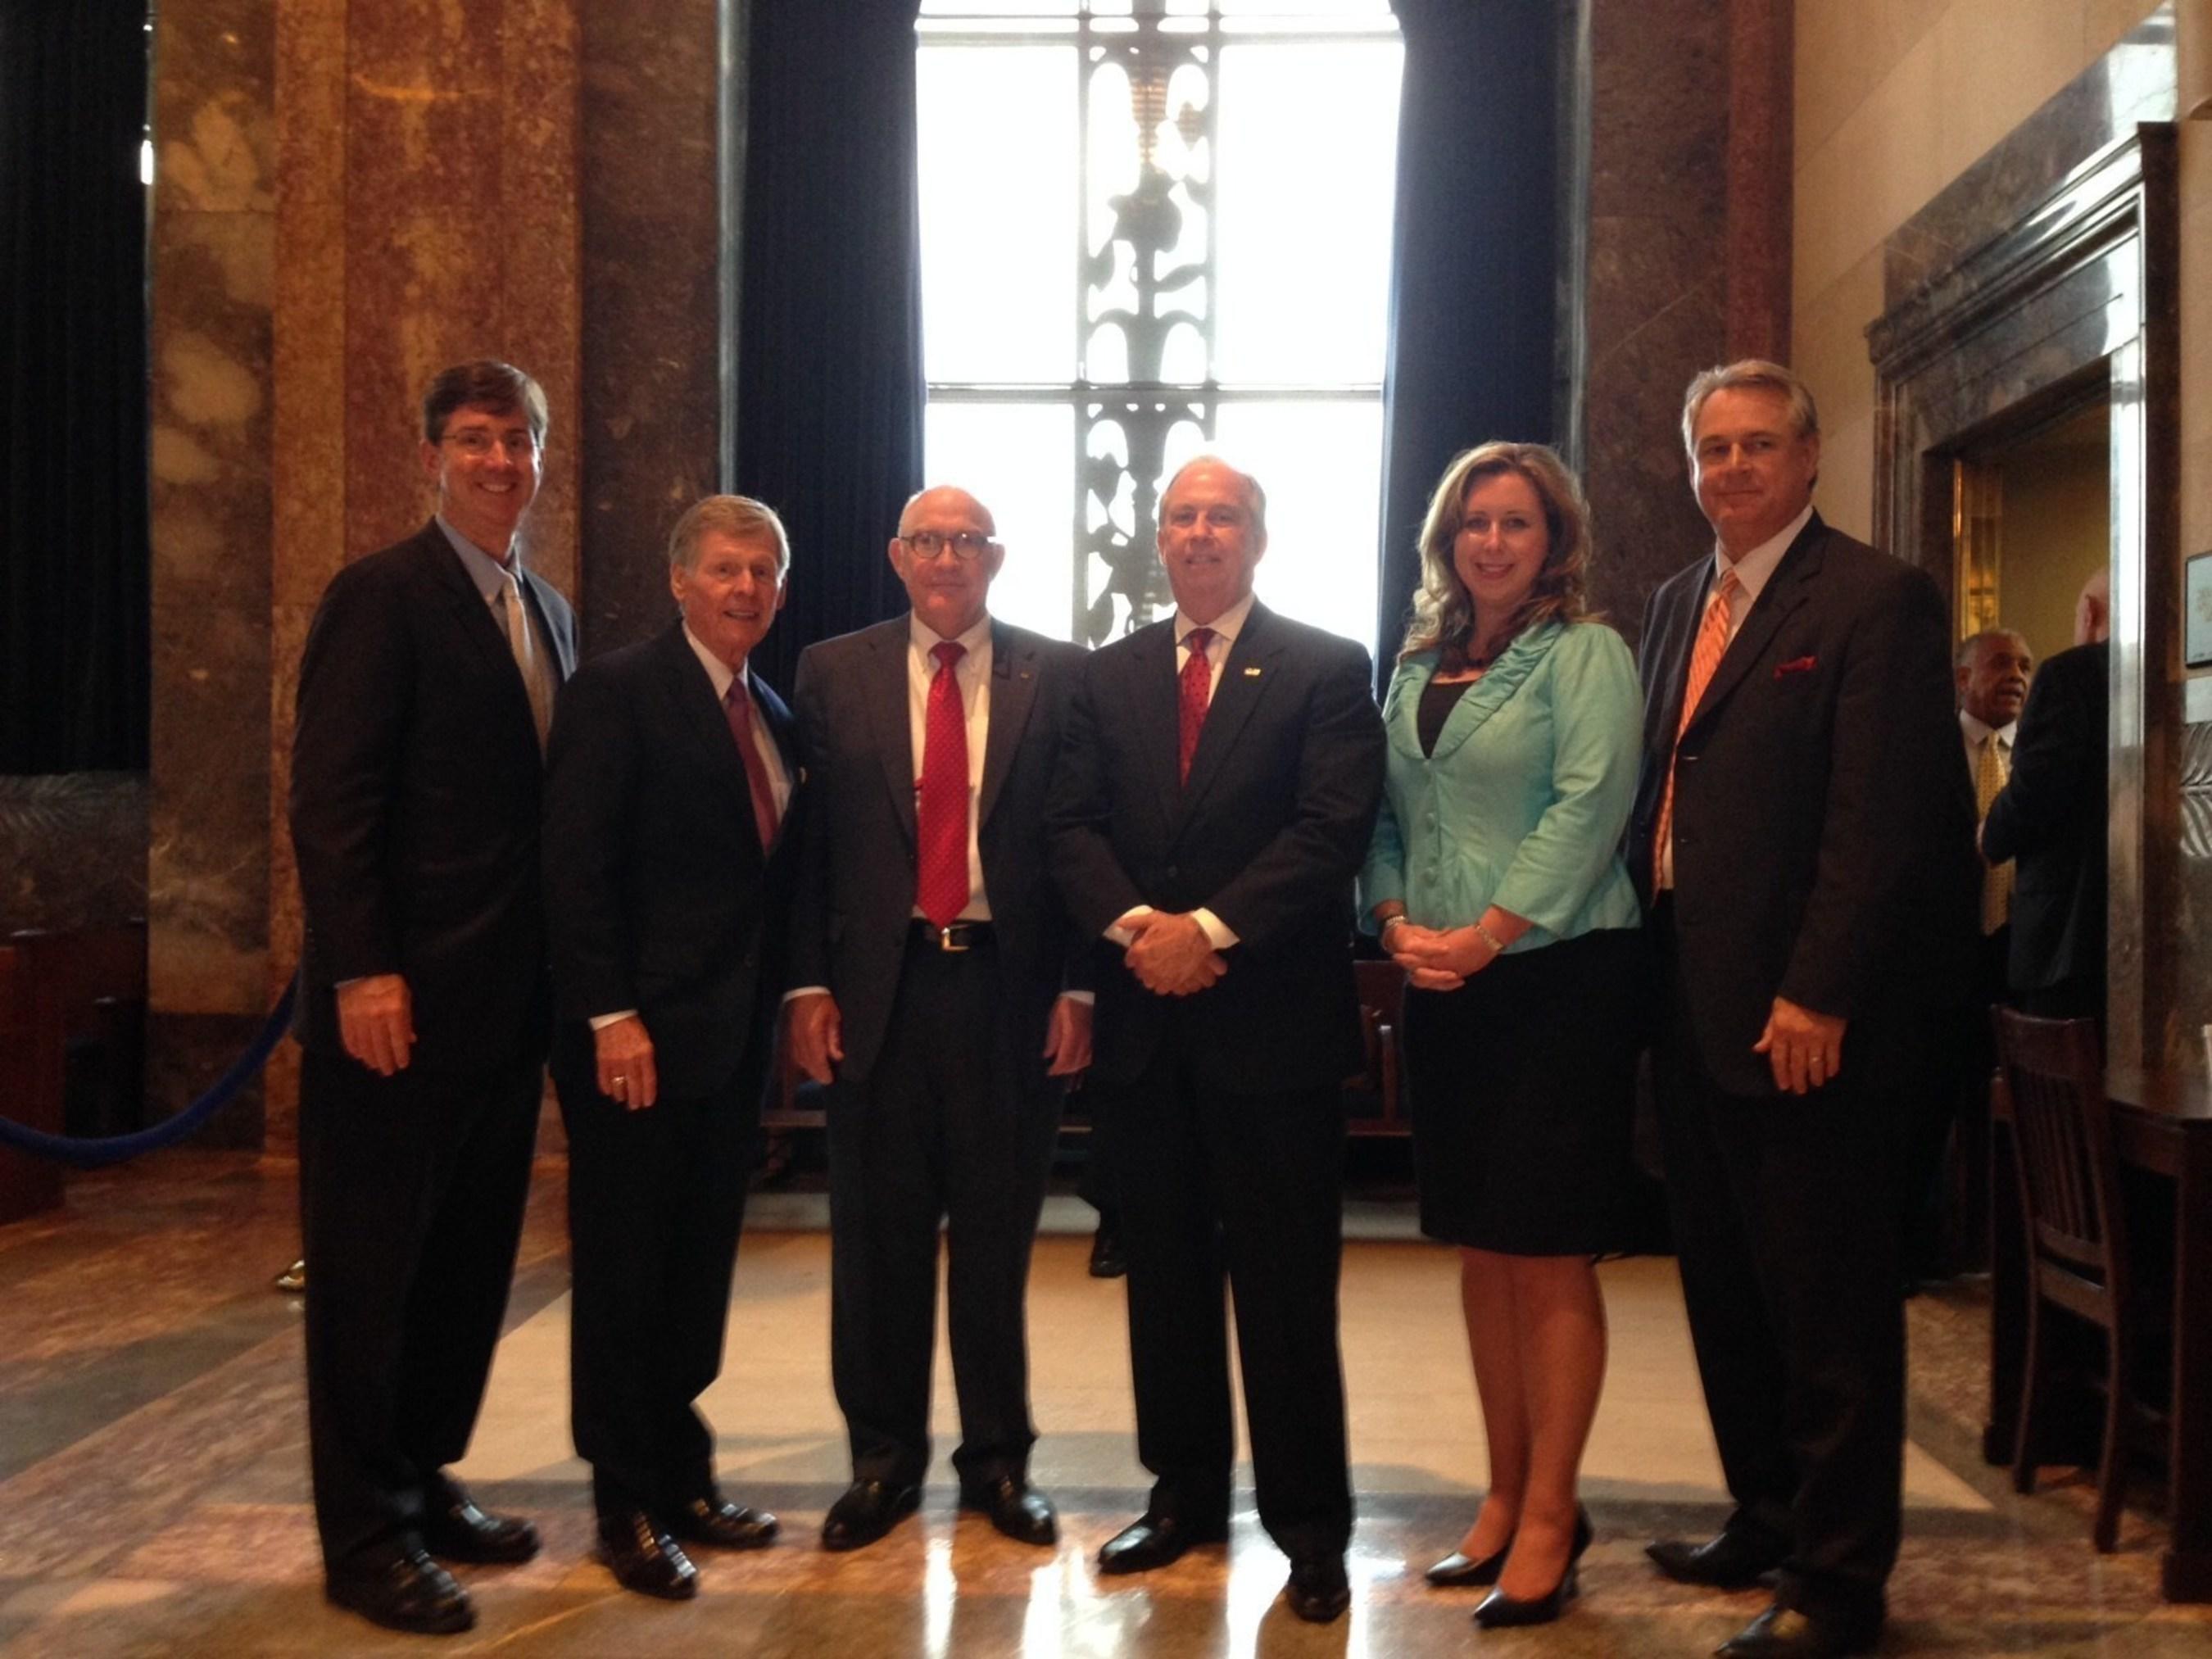 Louisiana Legislators Commend FHLB Dallas on 25th Anniversary of Affordable Housing Program